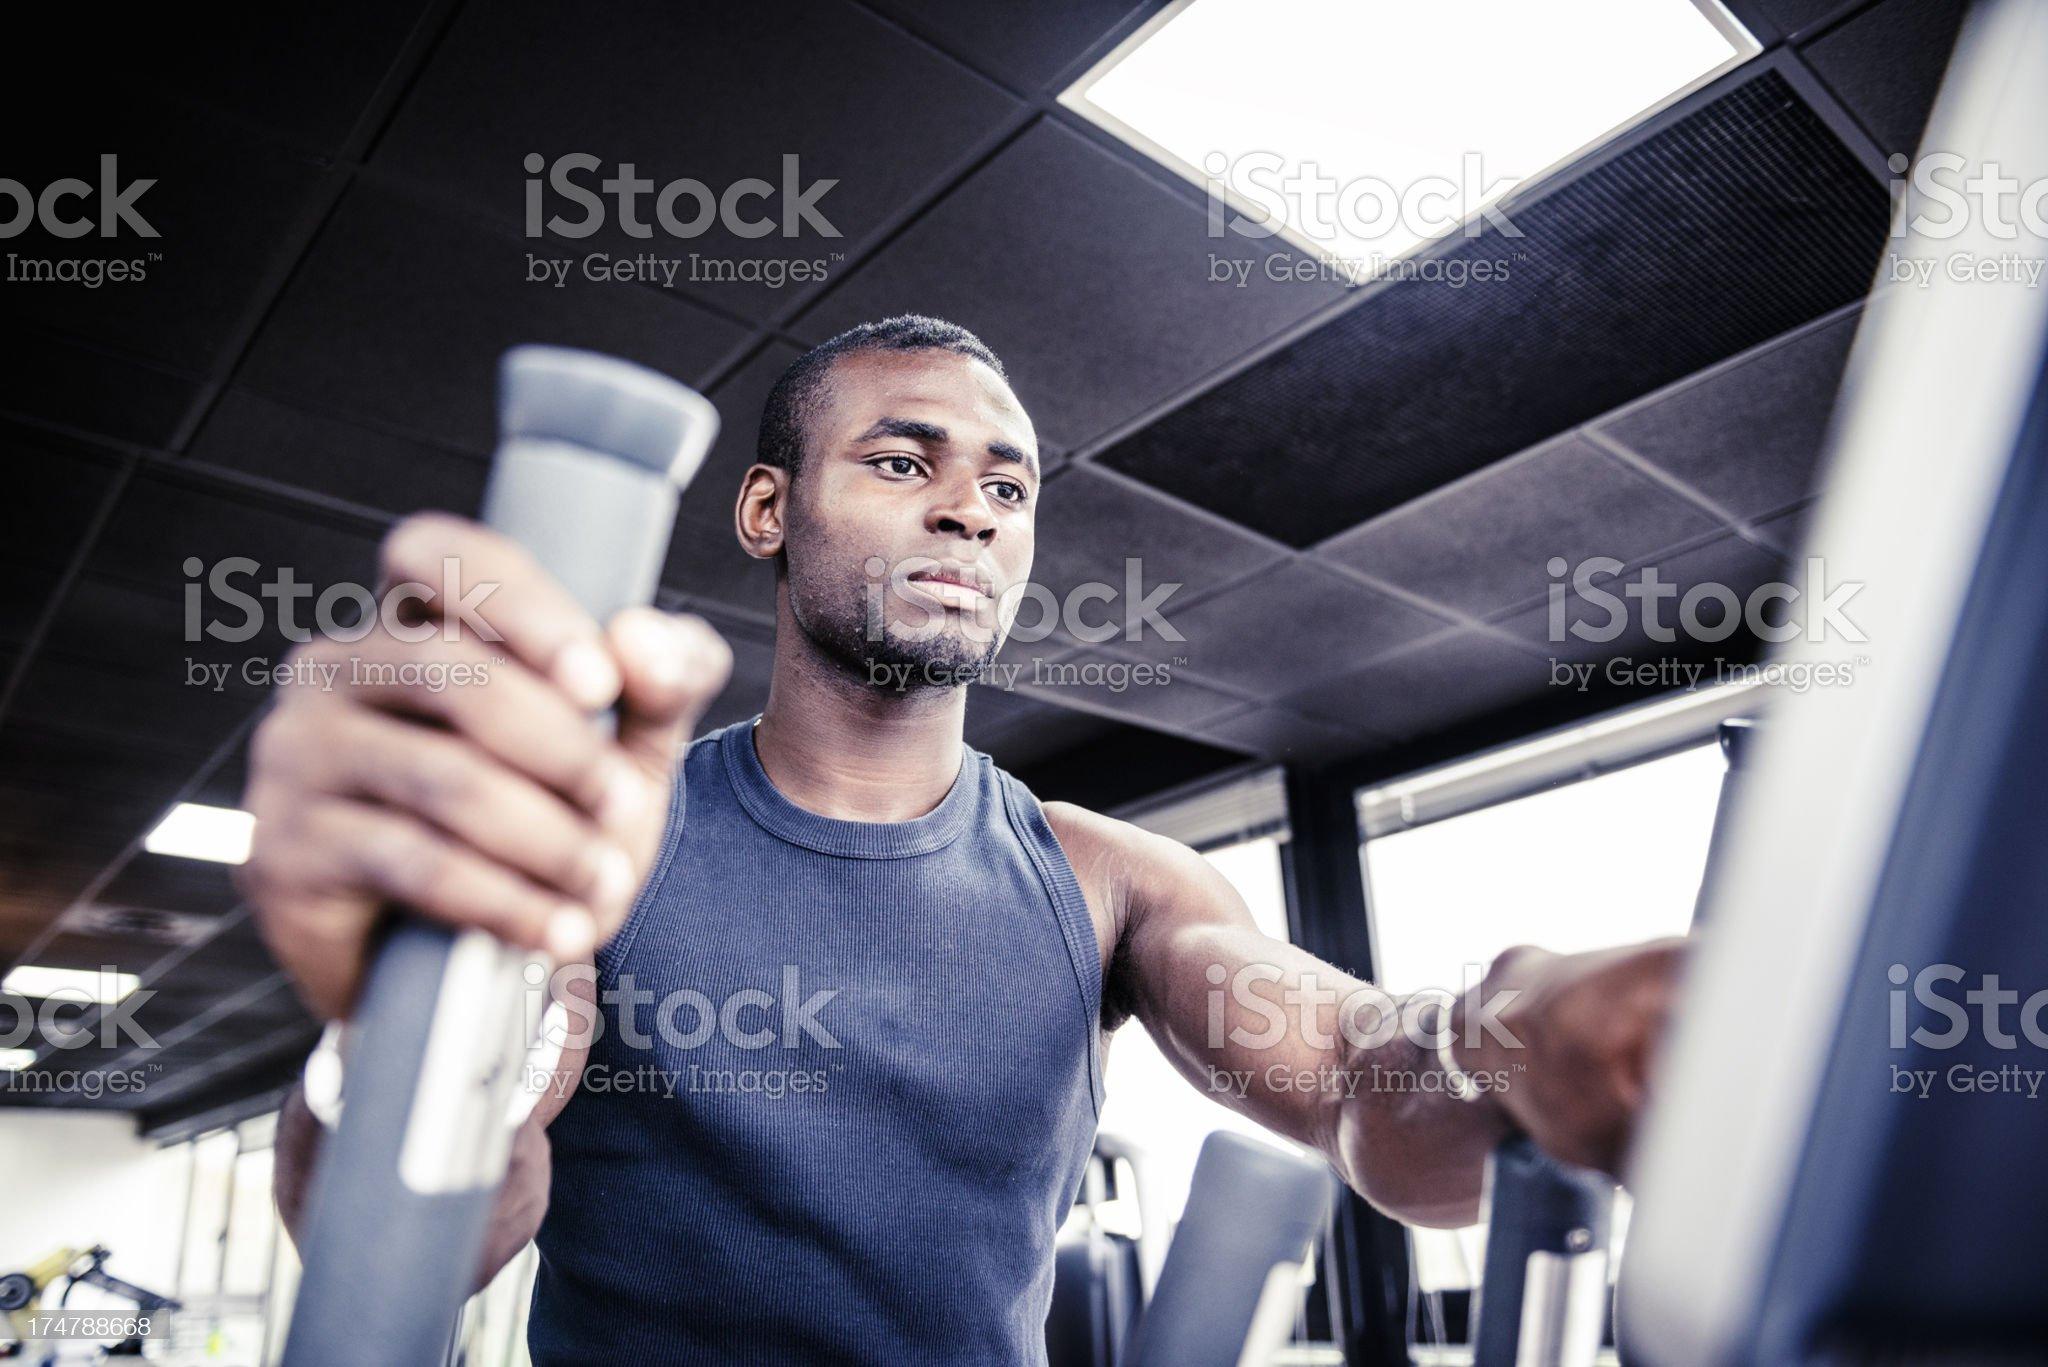 Man on Cardio machine inside a gym royalty-free stock photo